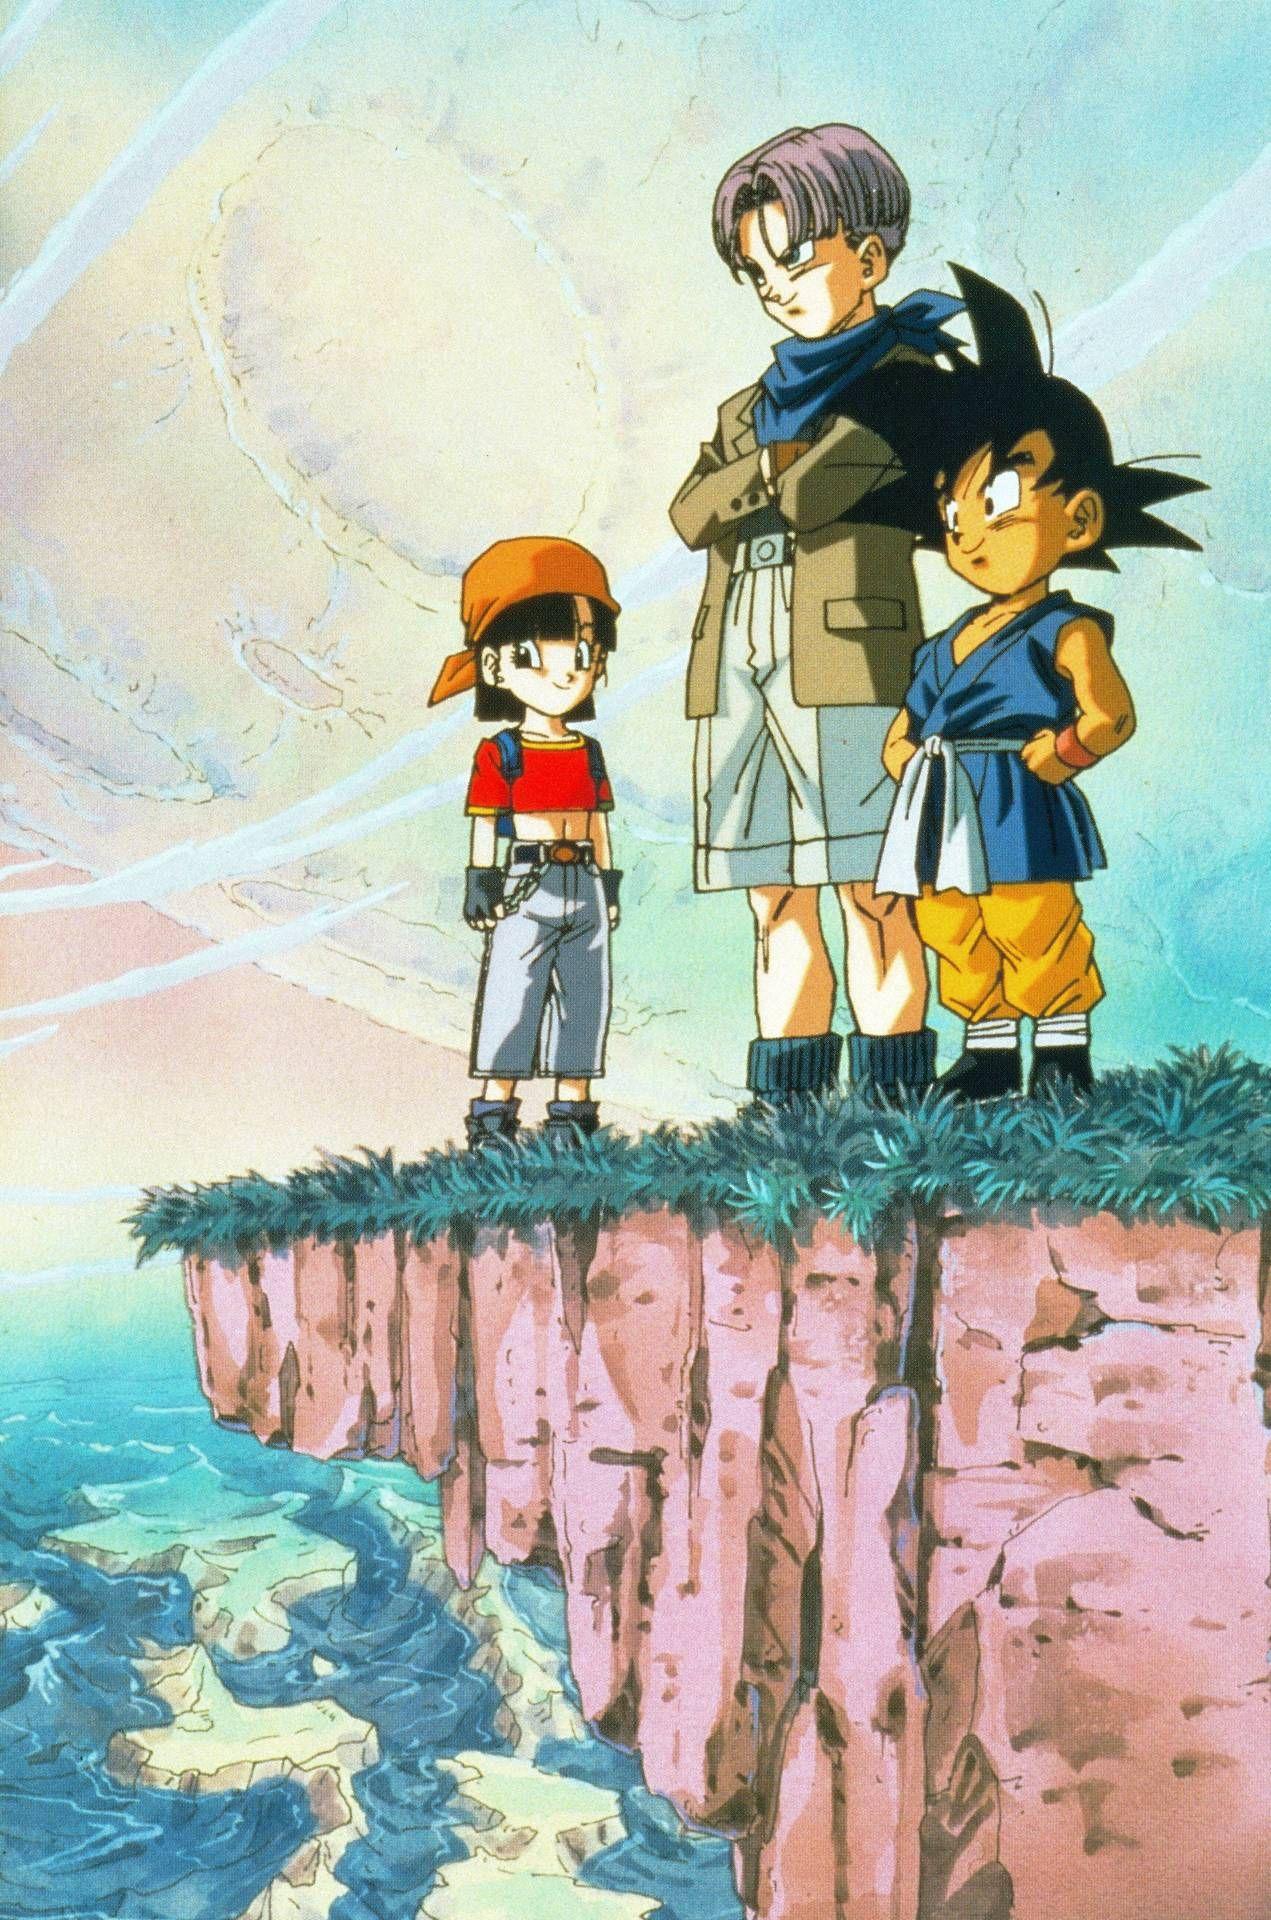 80s 90s Dragon Ball Art Photo Dragon Ball Art Anime Dragon Ball Dragon Ball Z